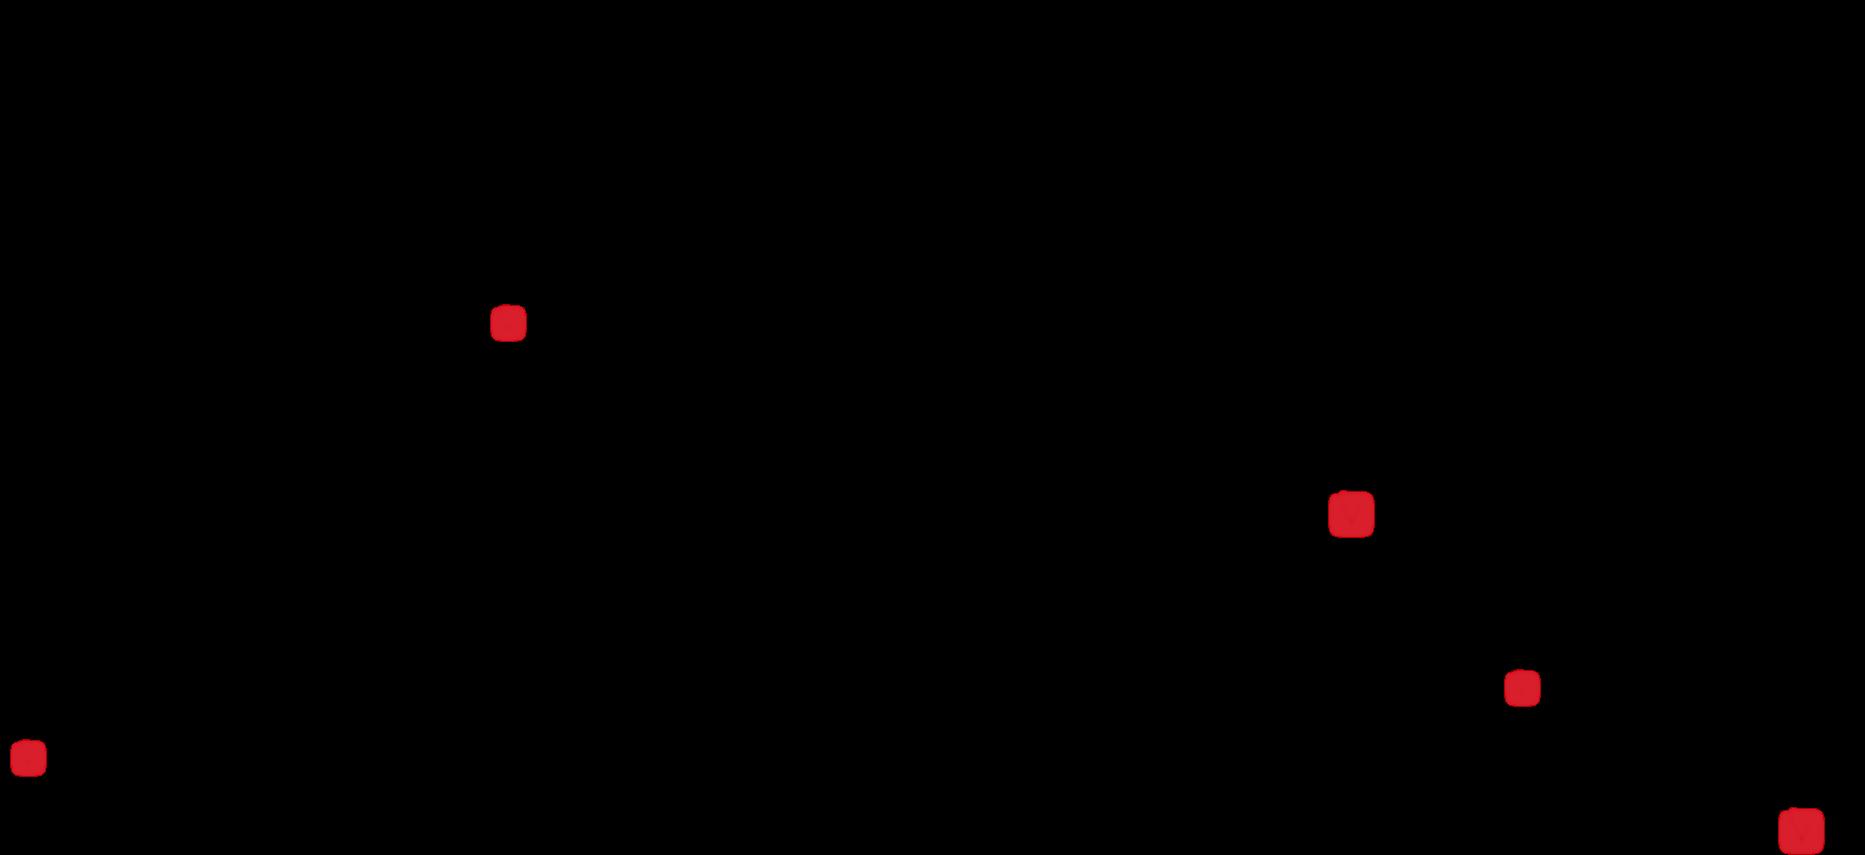 vSign logo background